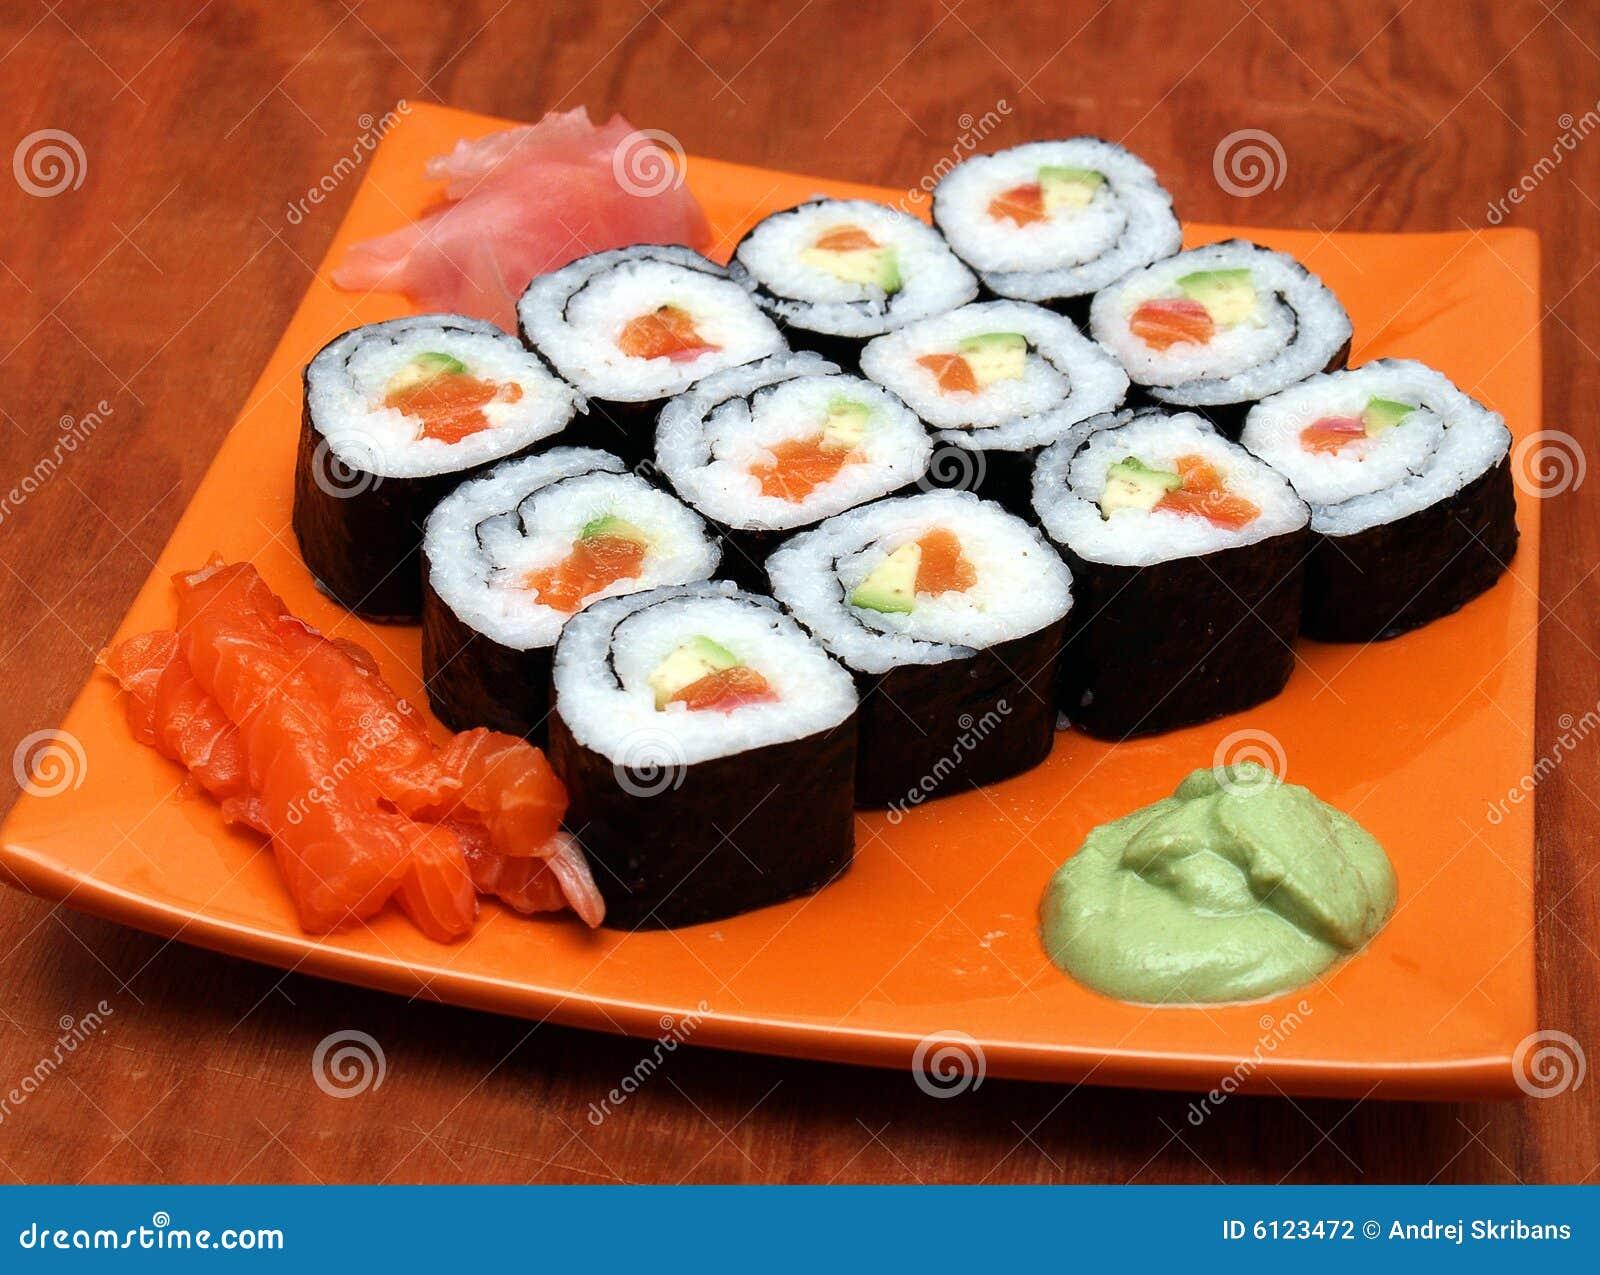 Sake avocado maki sushi stock photo. Image of dining, fish ...